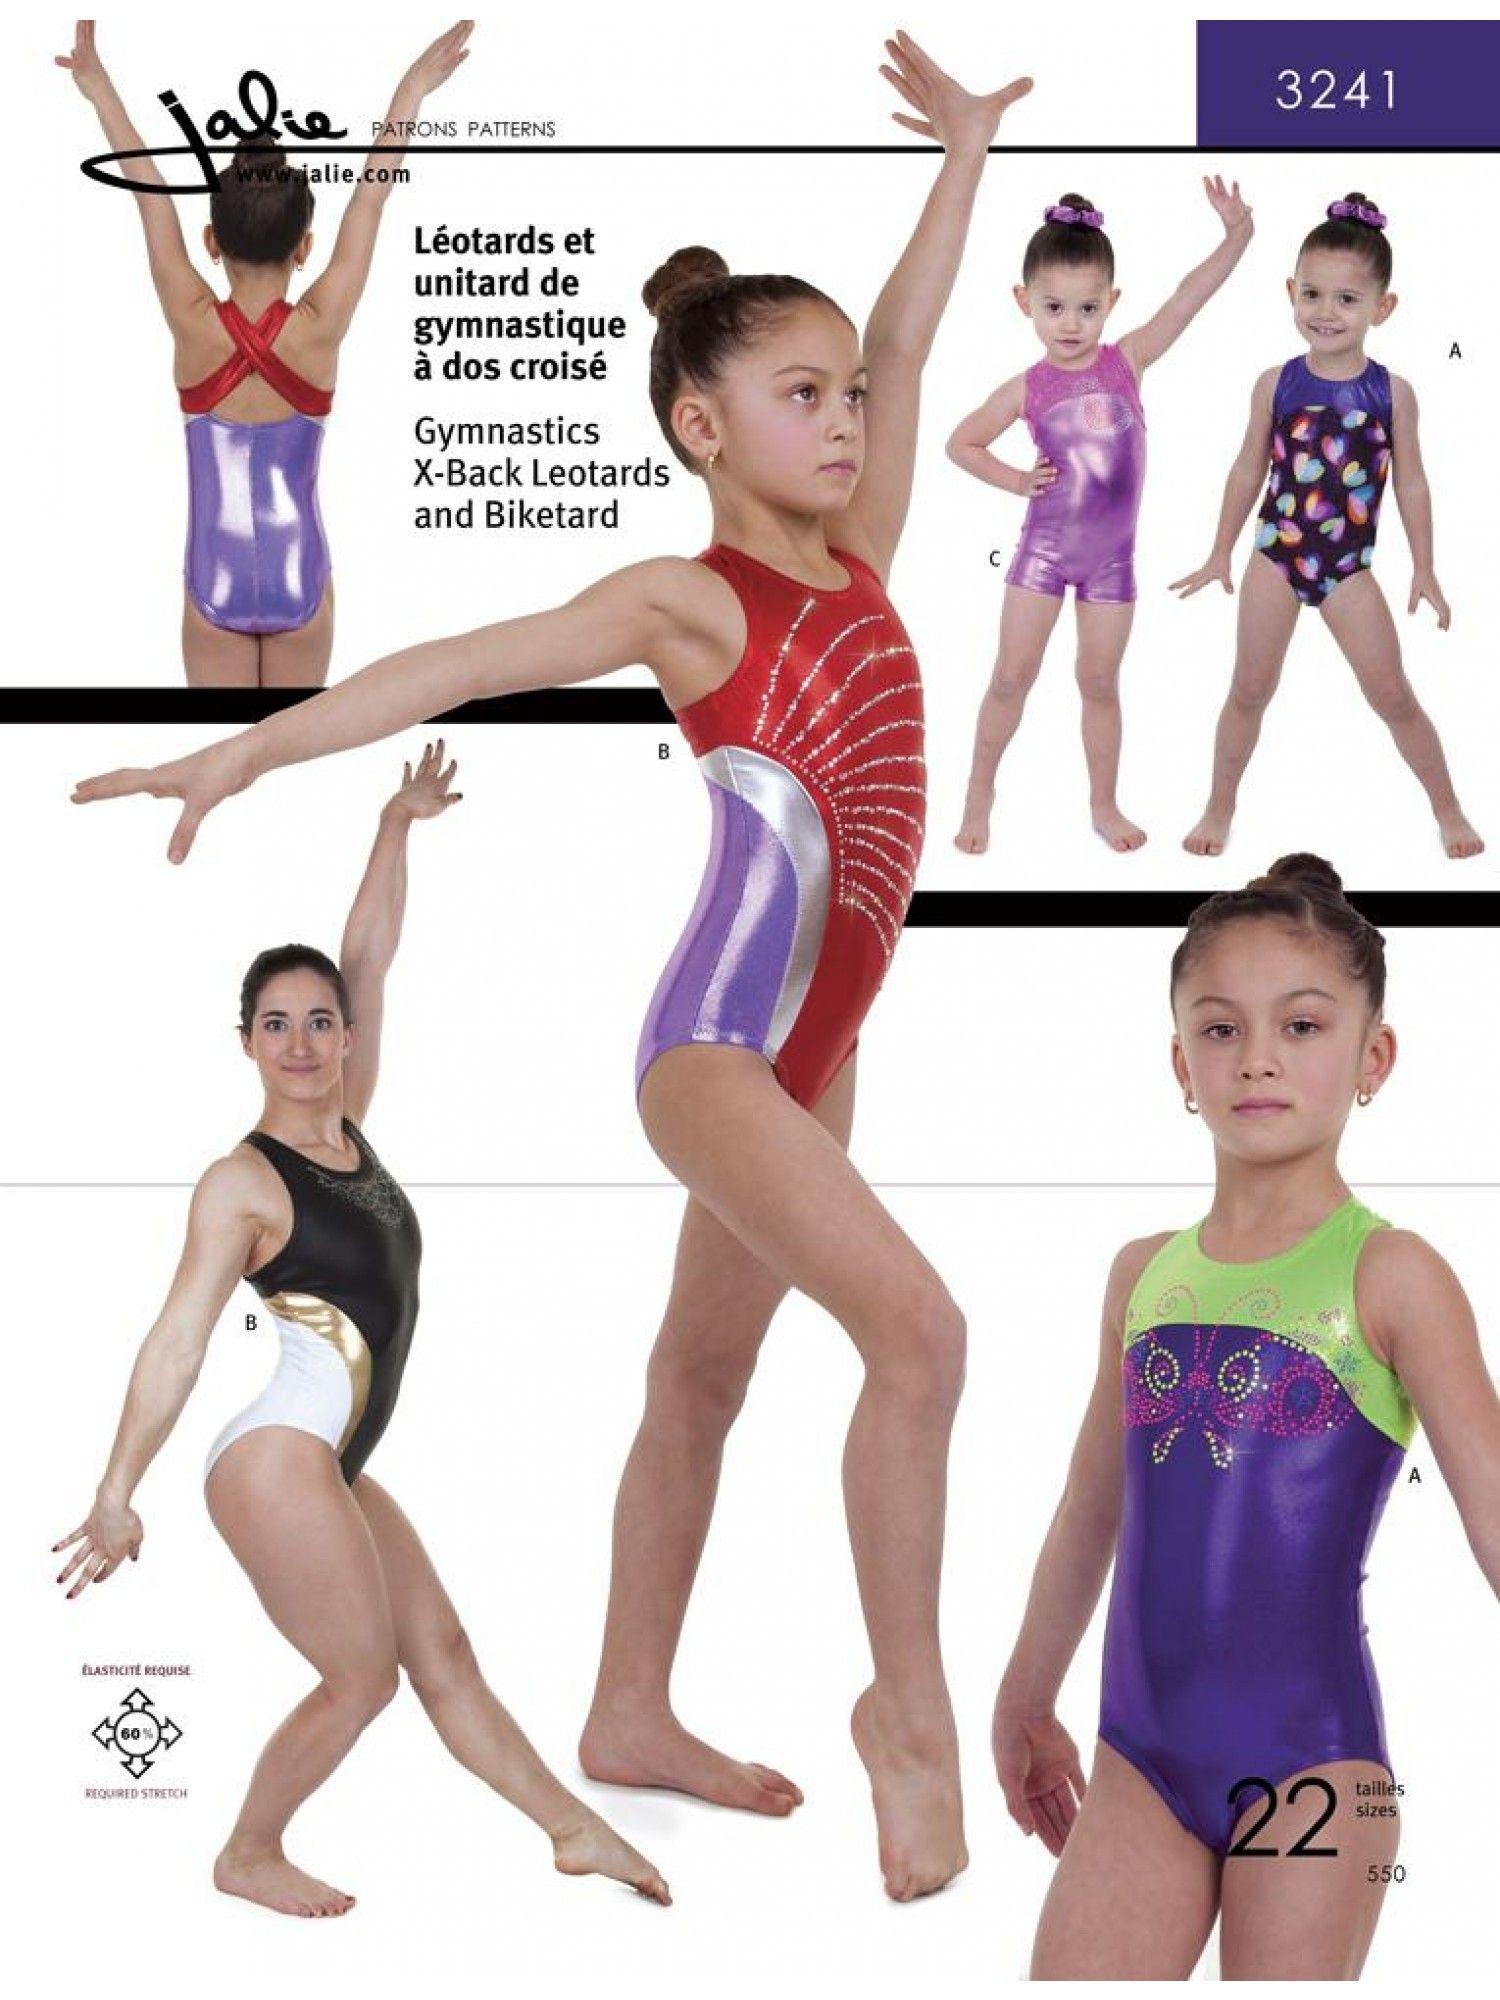 X-Back Gymnastics Leotards and Biketard